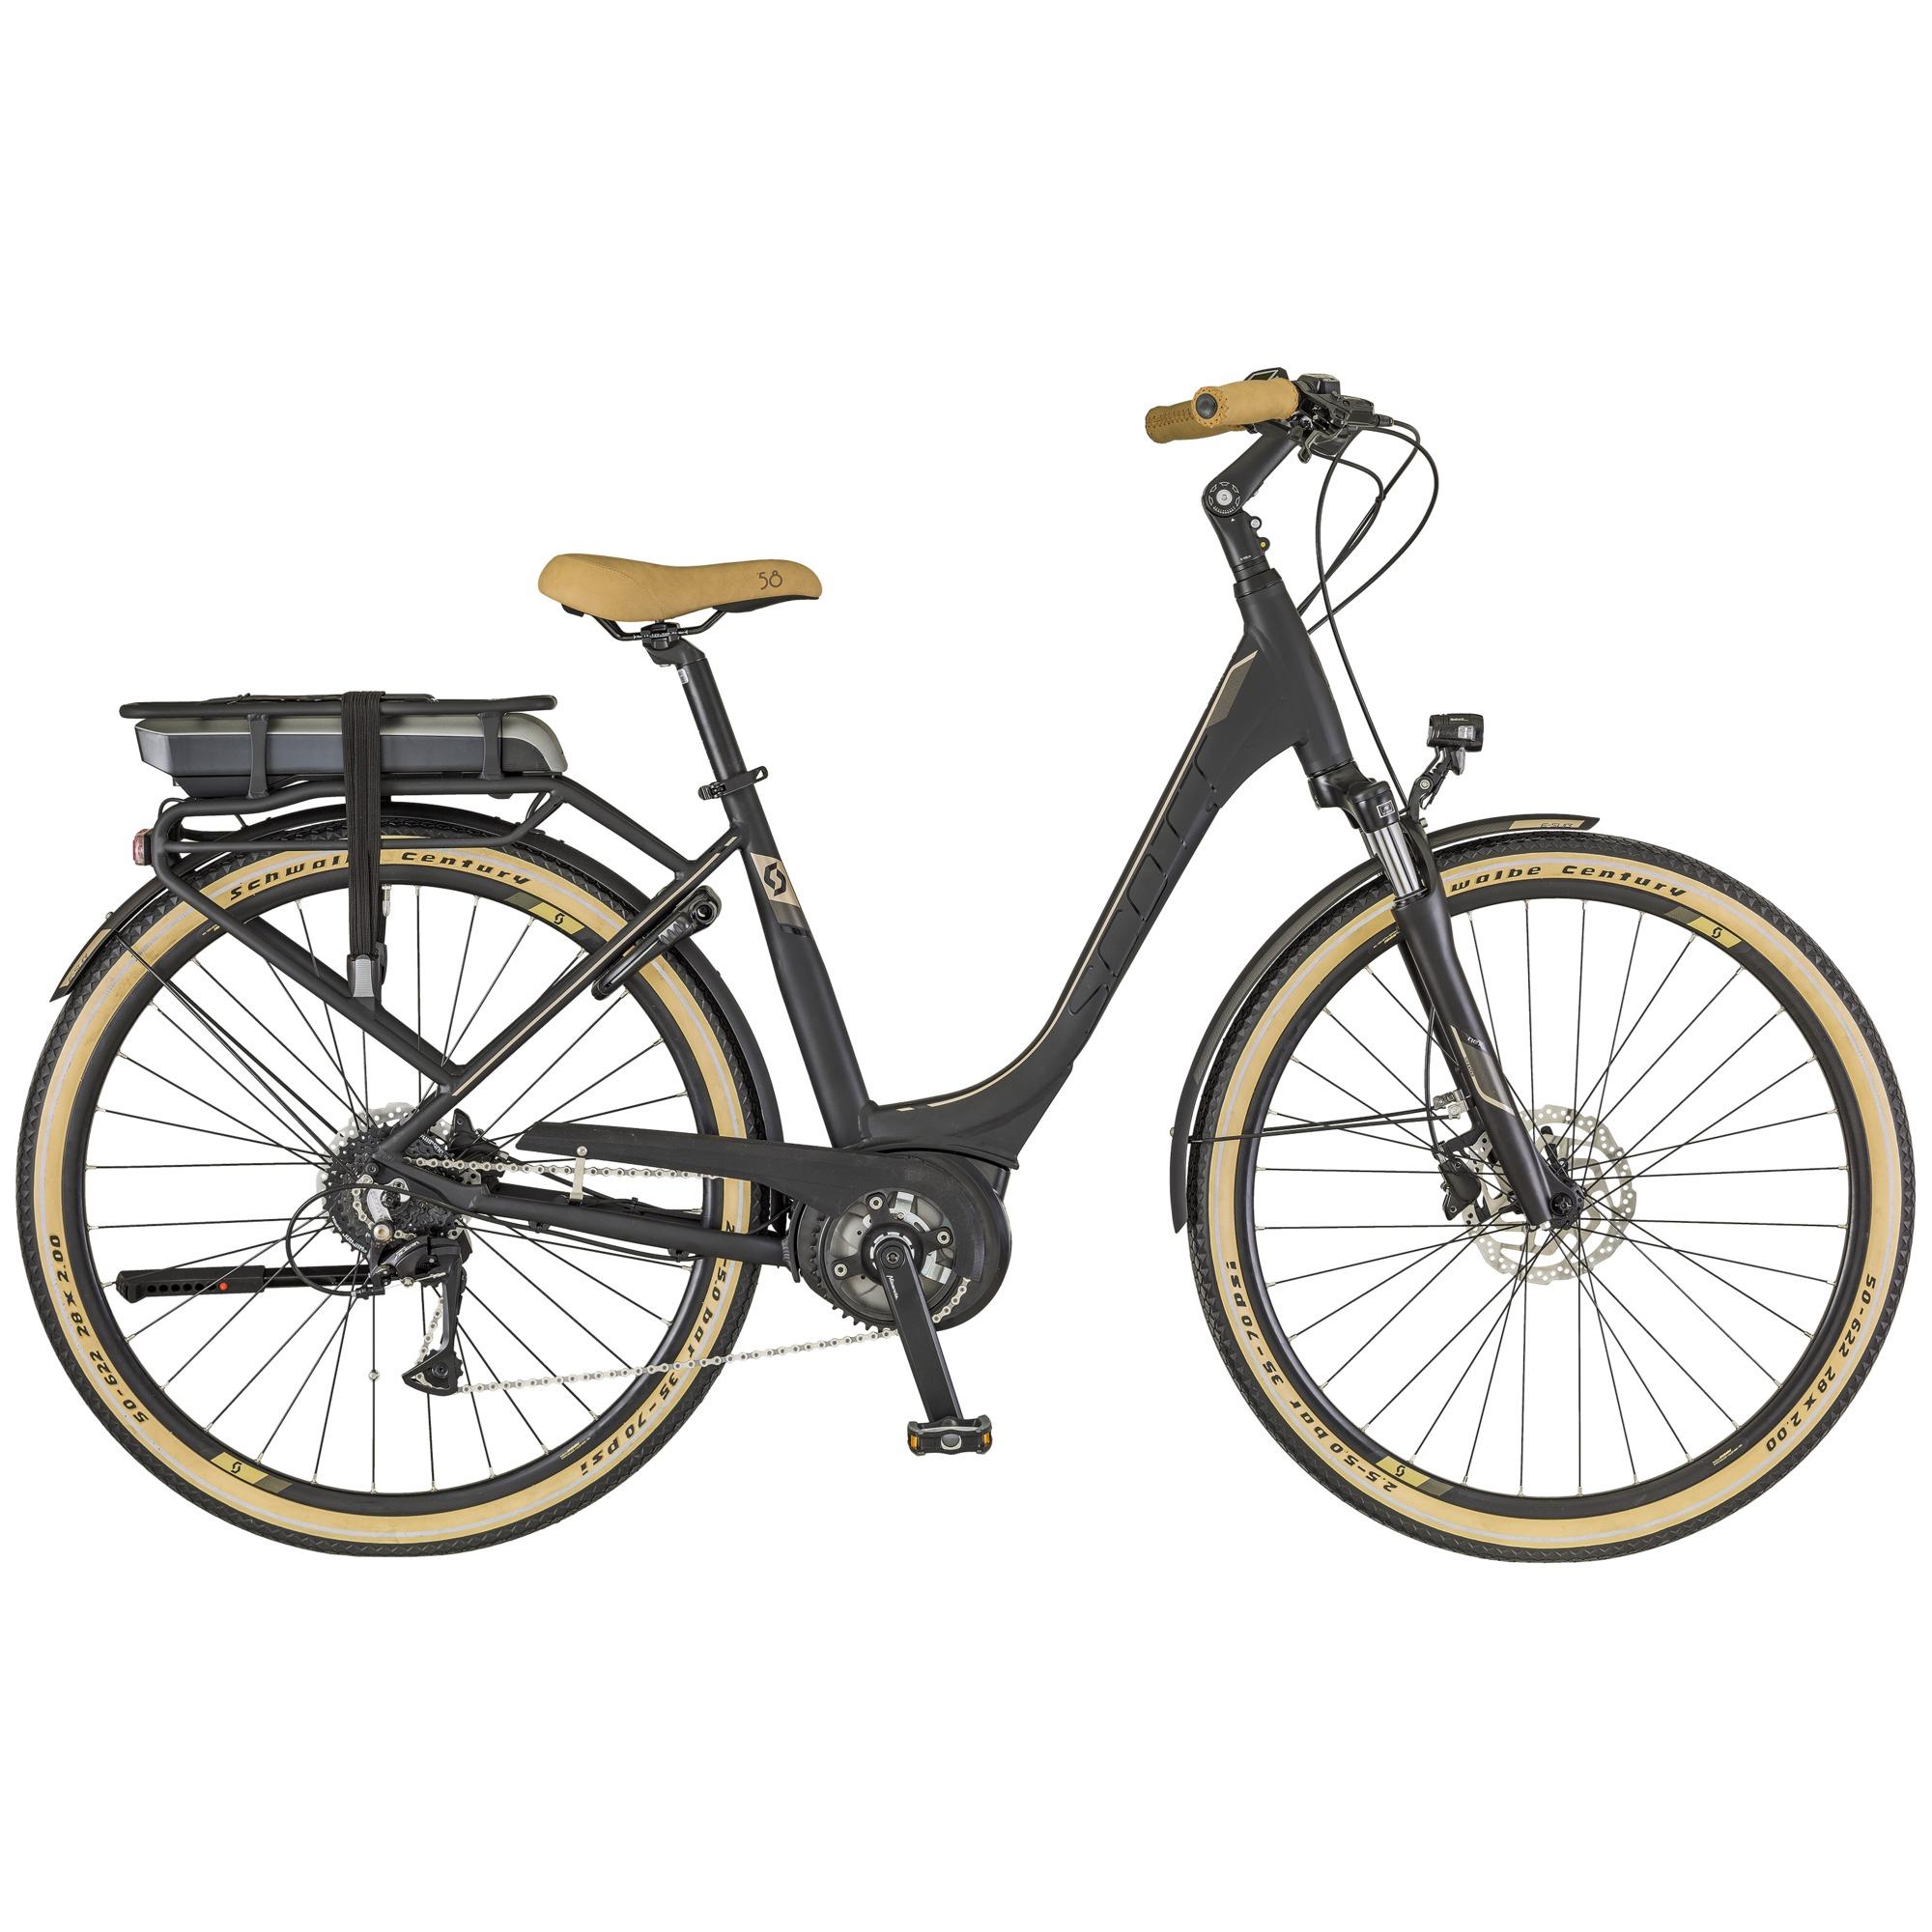 SCO E-Sub Active Unisex Bike (Gepäckträgerausführung) S - SCO E-Sub Active Unisex Bike (Gepäckträgerausführung) S